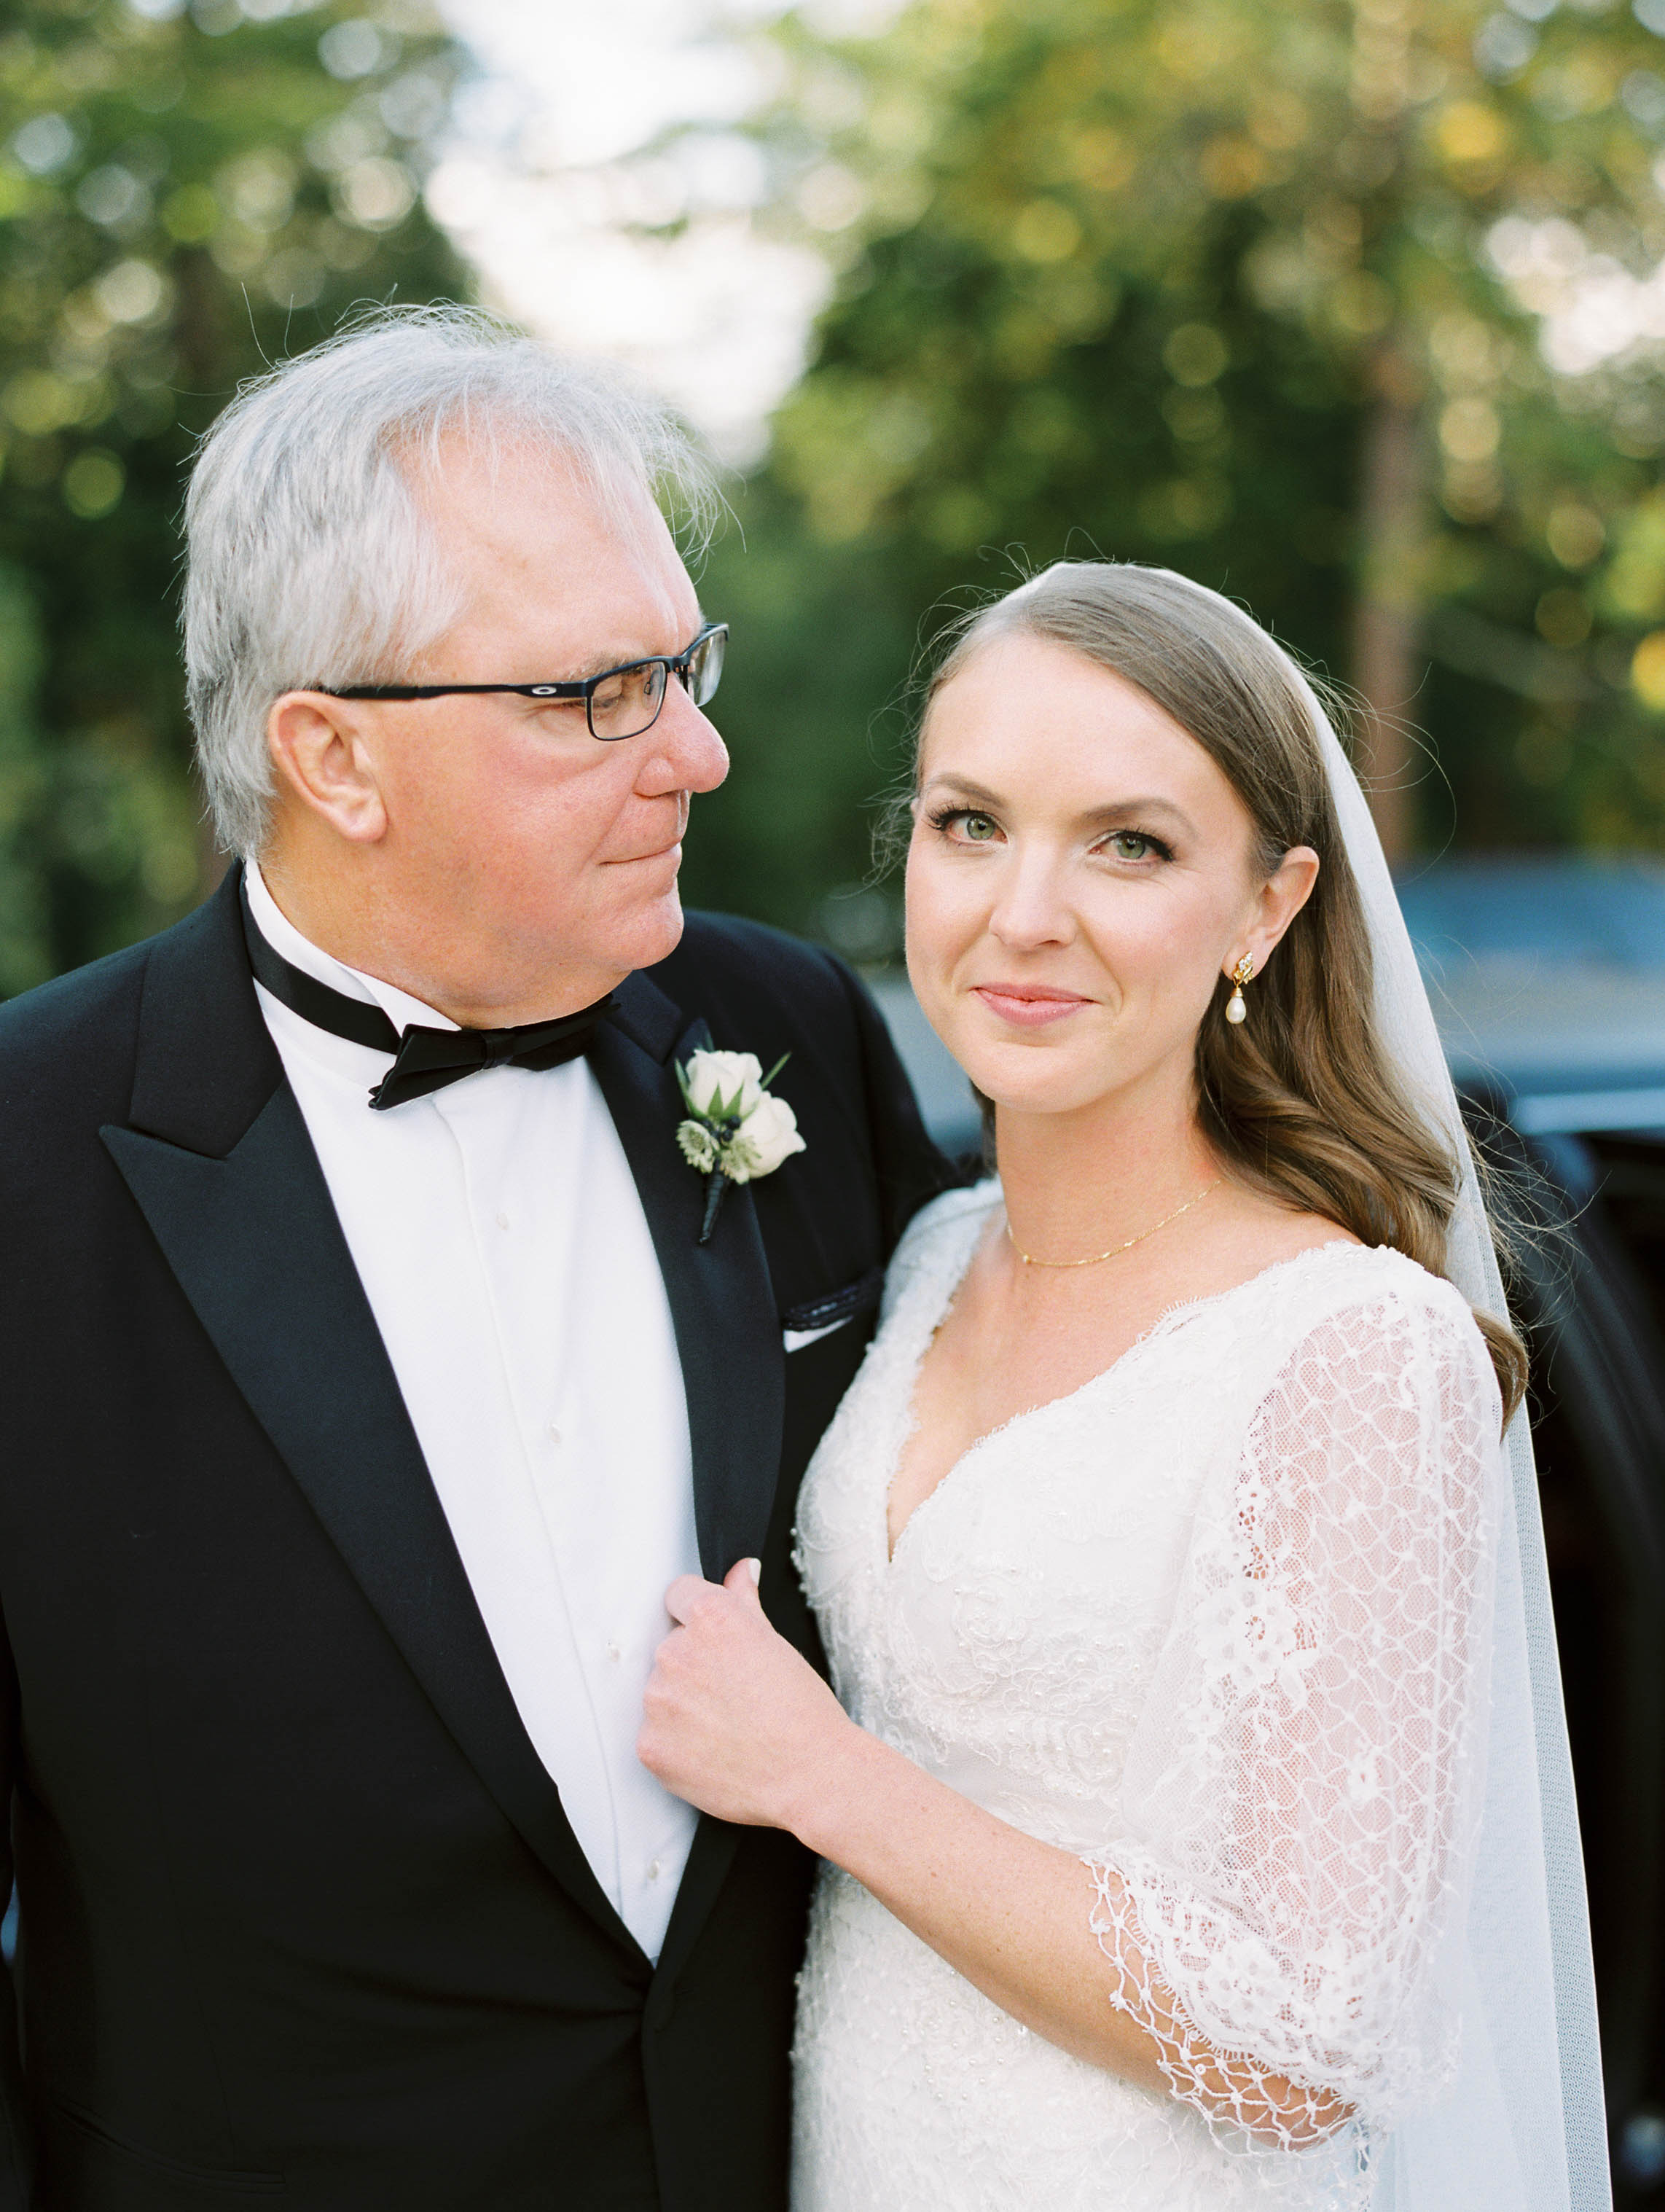 kelsandmichael_weddingphotography_rhodeislandwedding-31.jpg